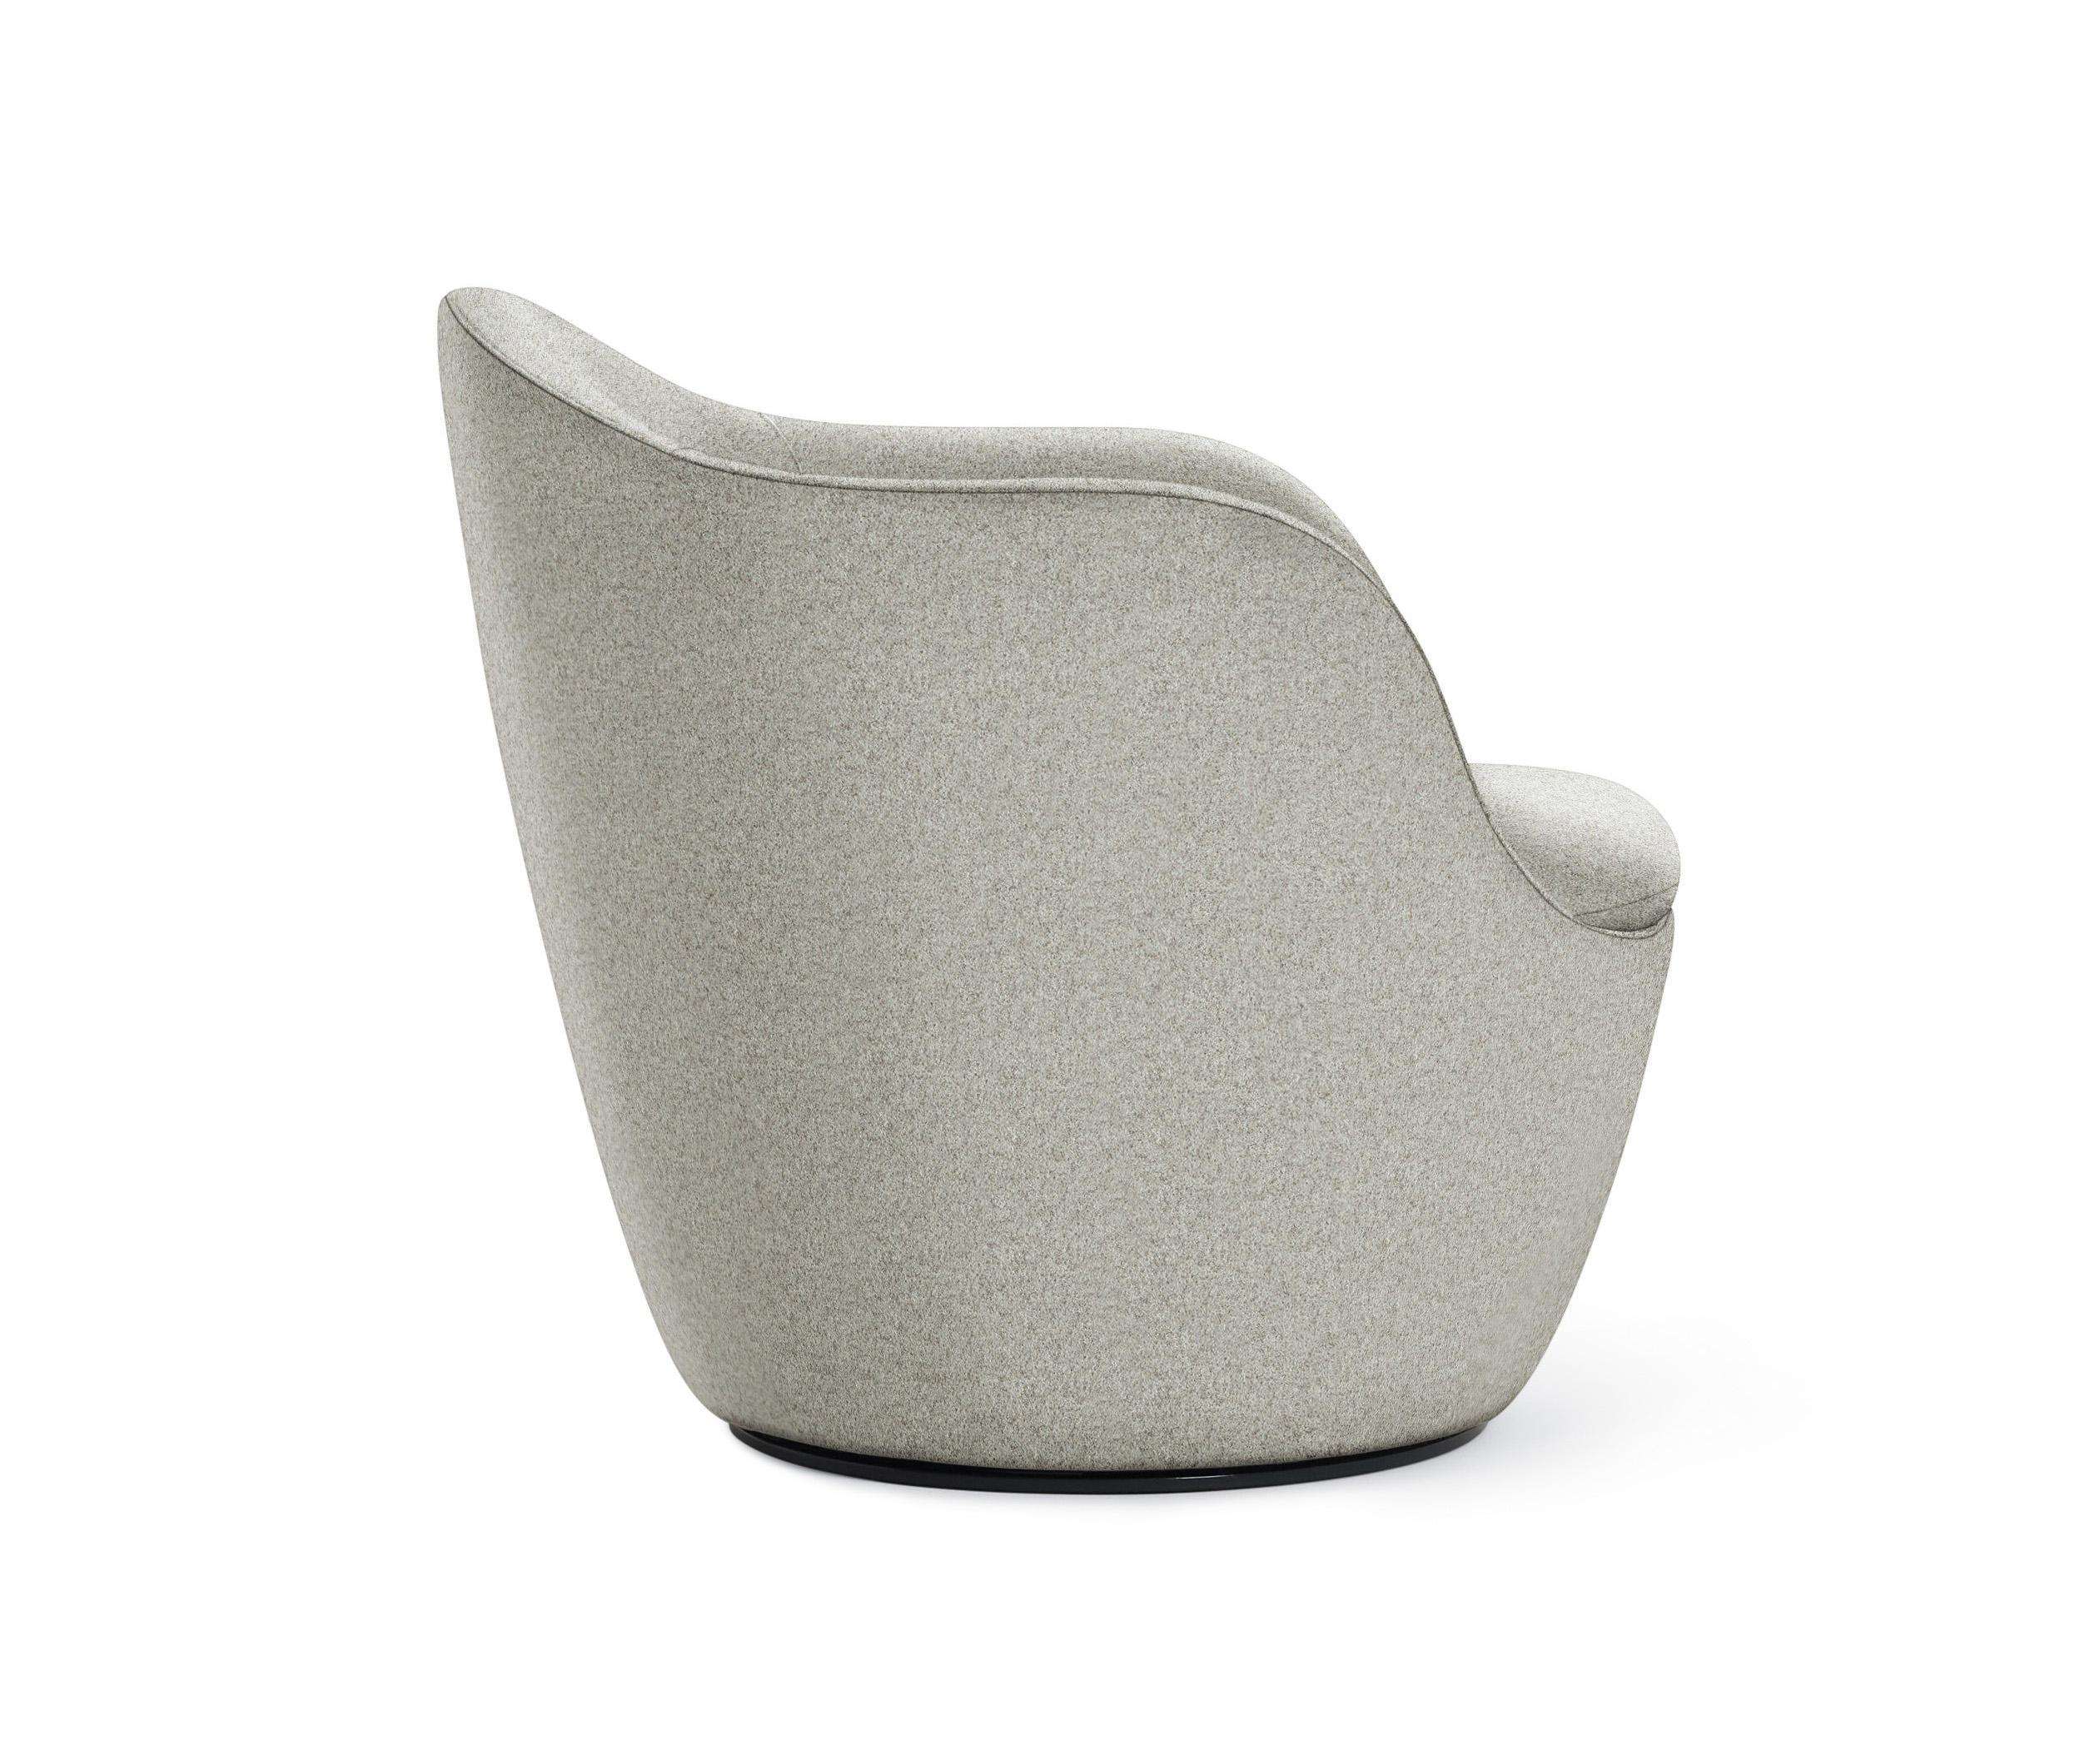 Groovy Lina Swivel Chair Designer Furniture Architonic Dailytribune Chair Design For Home Dailytribuneorg